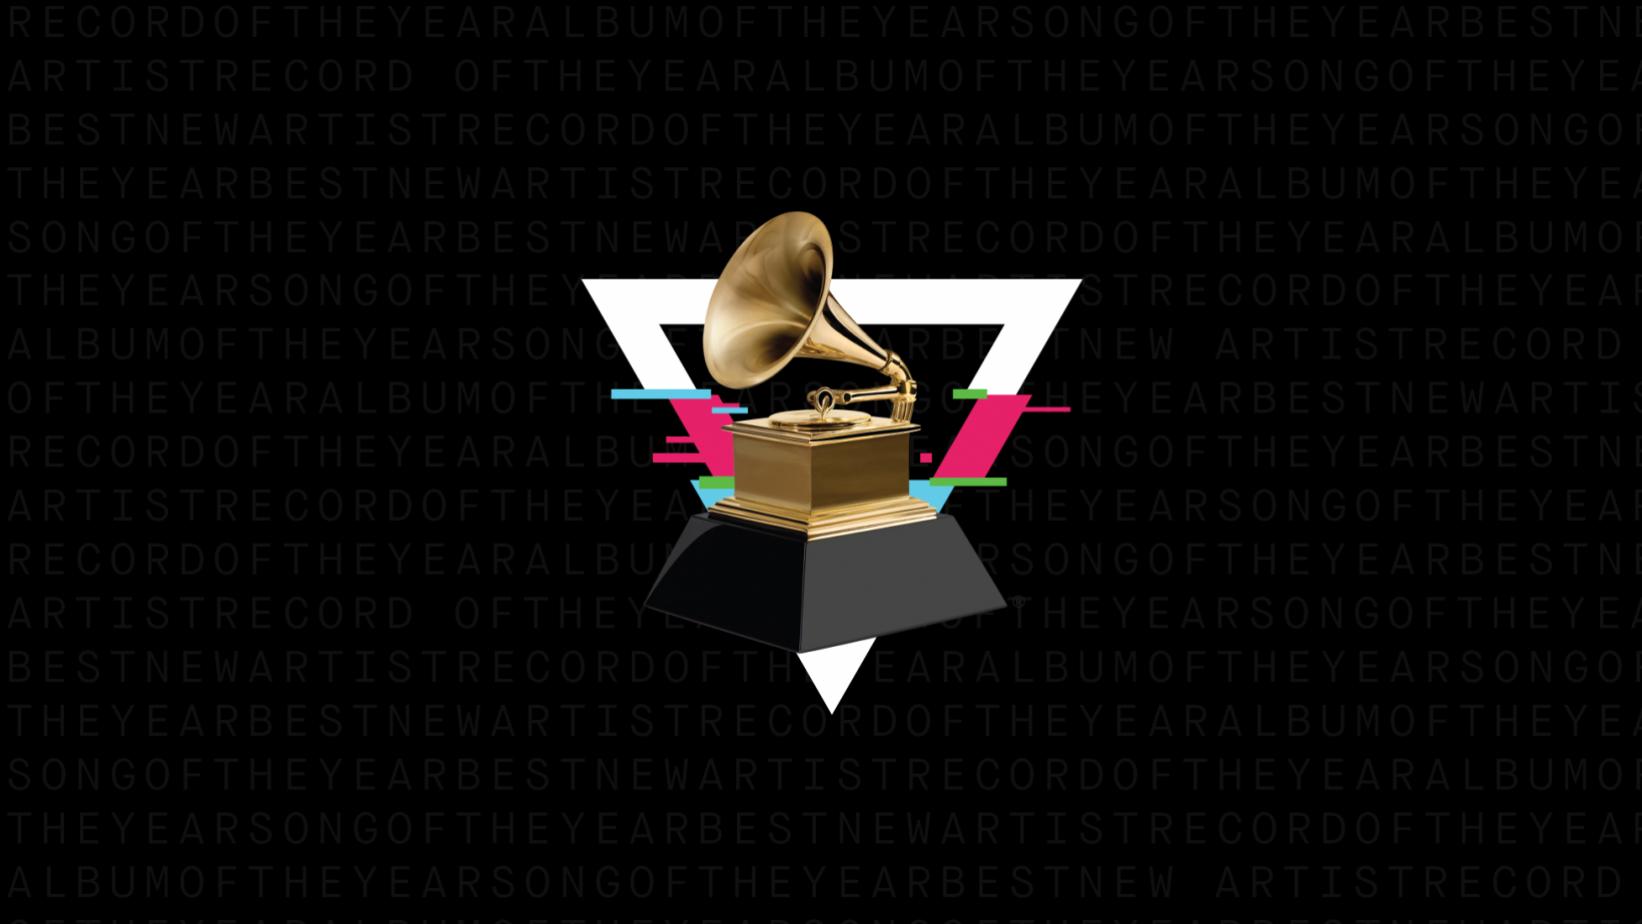 2020 Grammy Awards Complete Nominees List Grammy Com Grammy Awards Grammy Record Of The Year